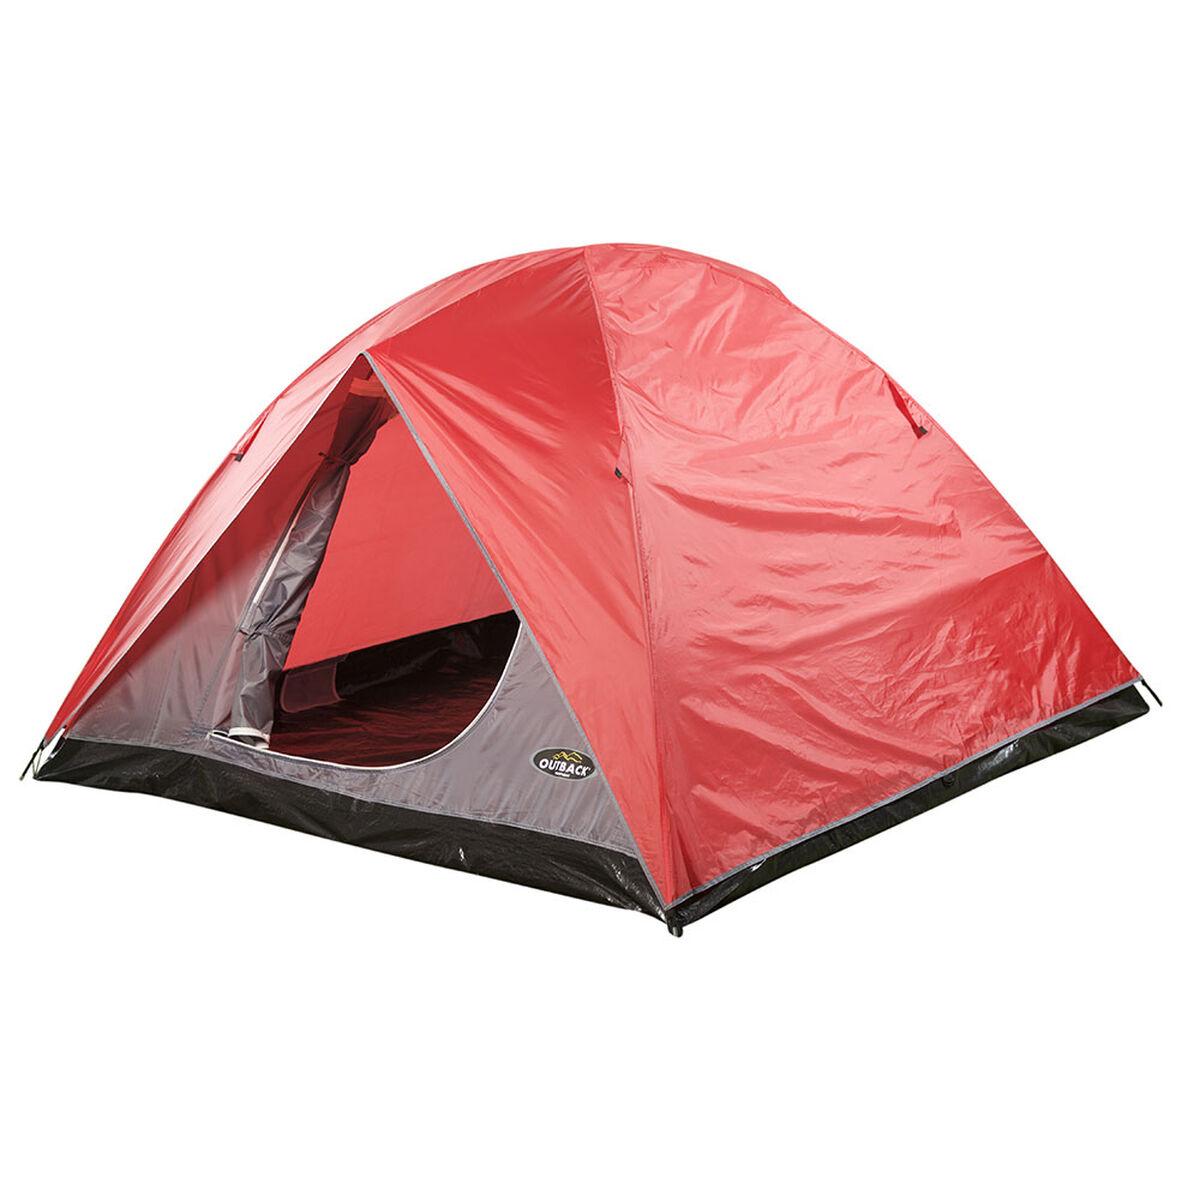 Carpa Outback Himalaya para 4 Personas Rojo